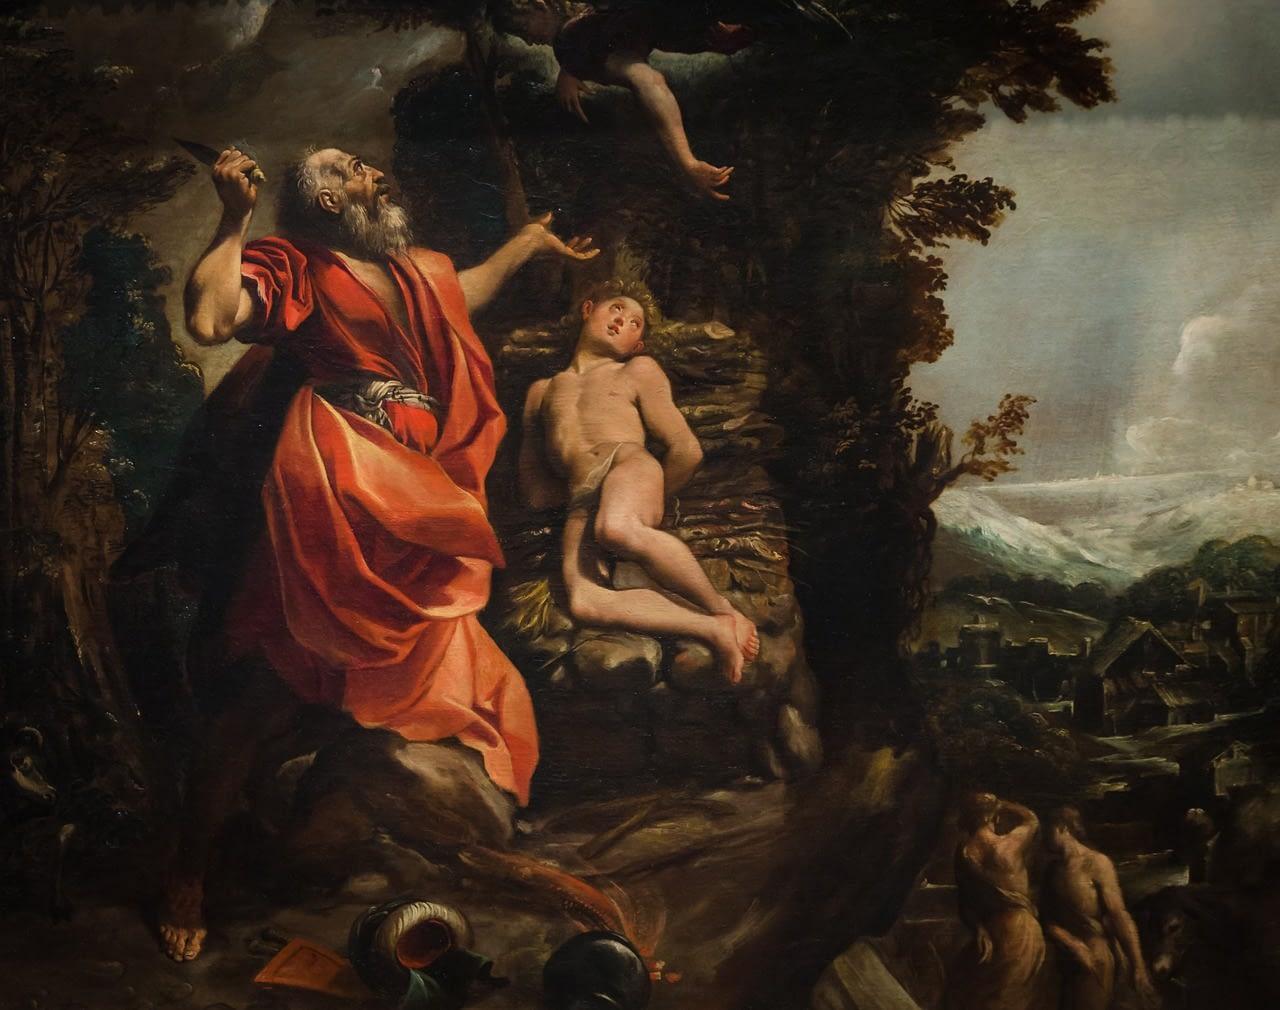 Abraomo ir Izaoko dilema